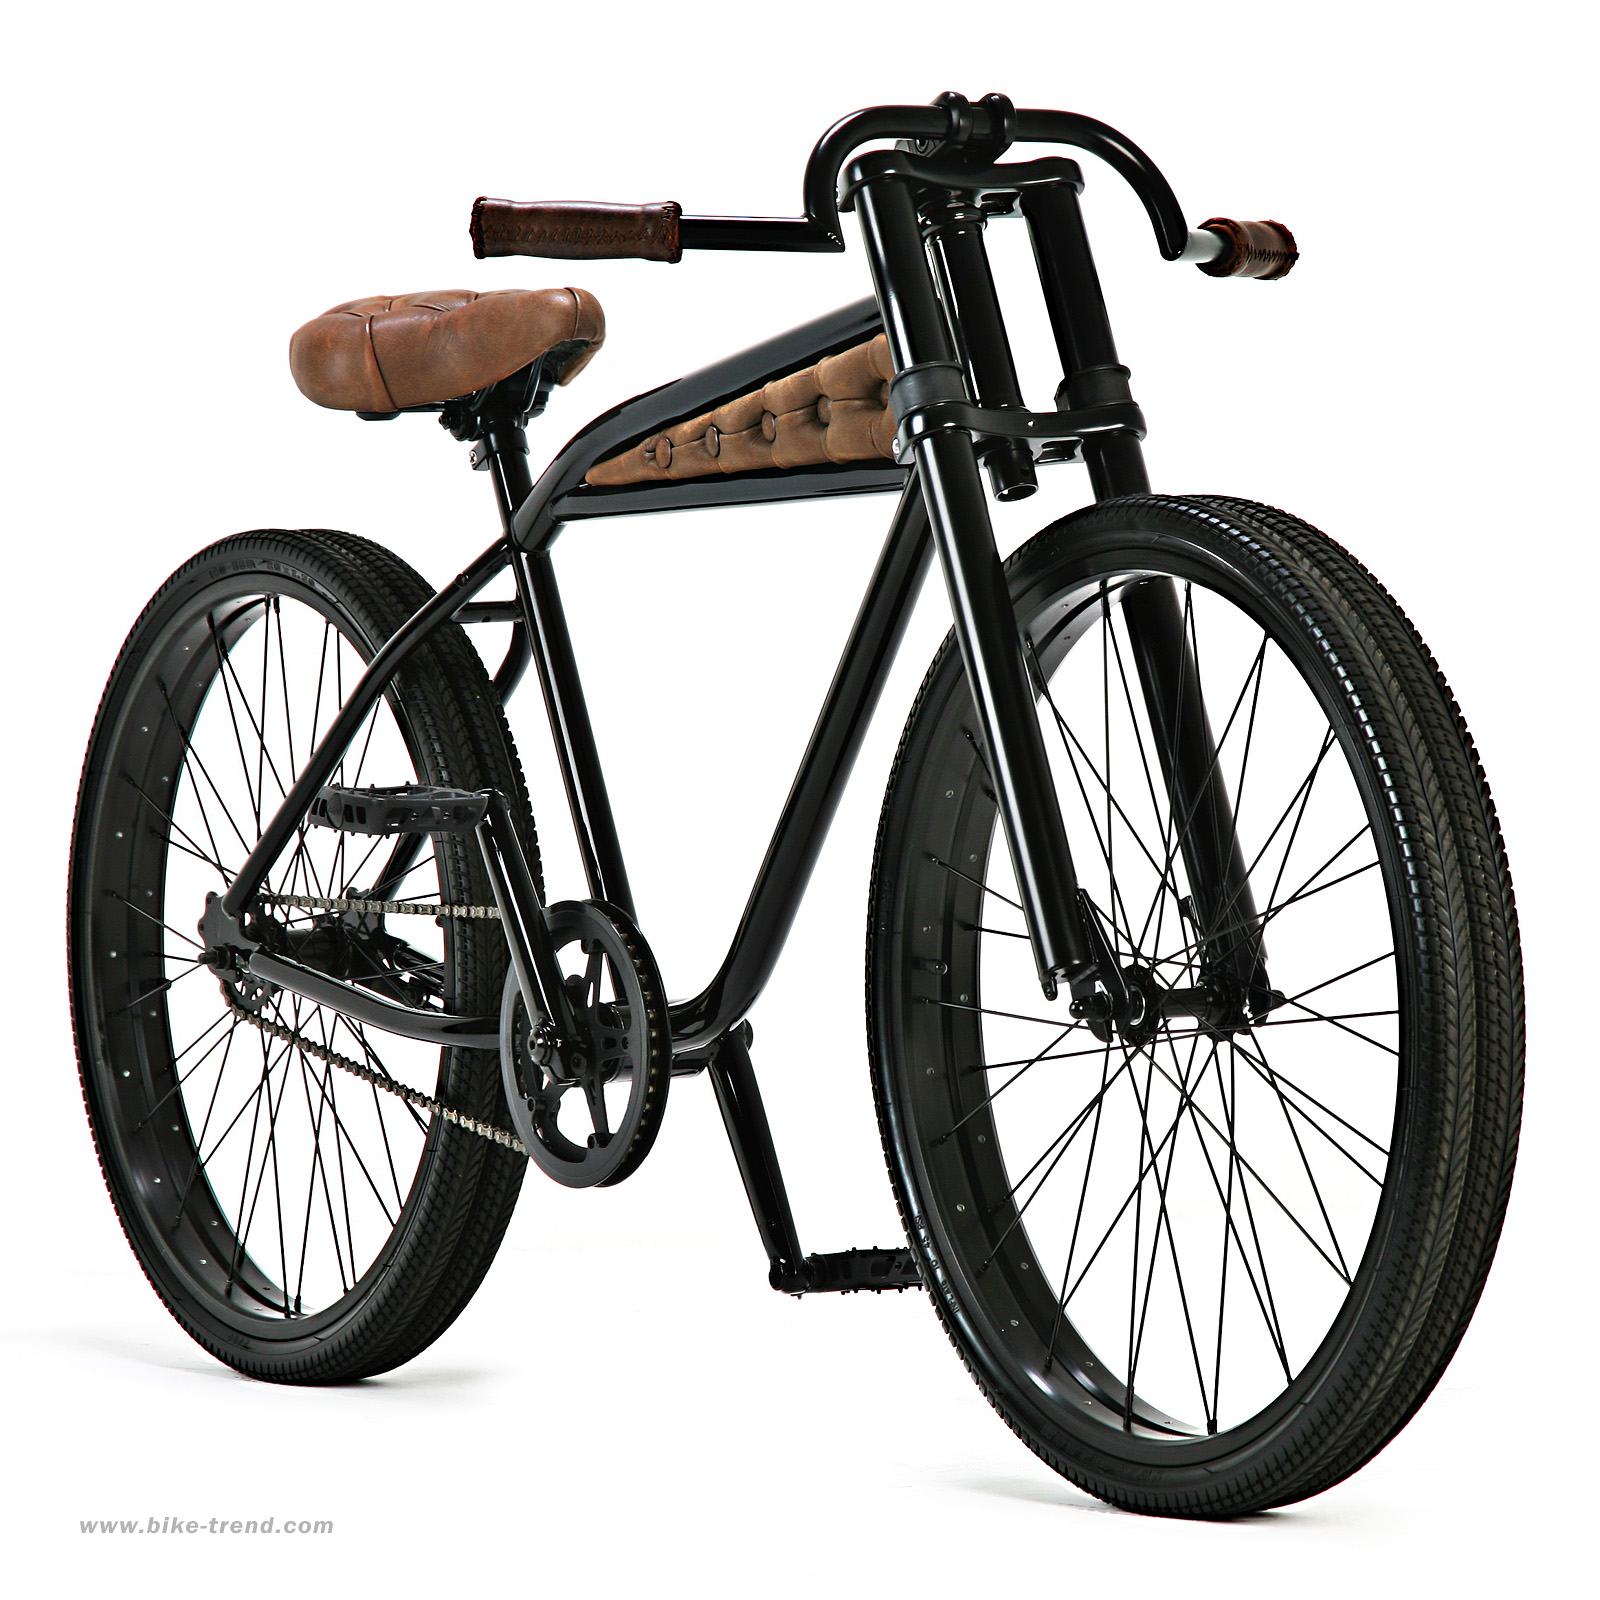 autum epitaph cruiser bike bike trend. Black Bedroom Furniture Sets. Home Design Ideas